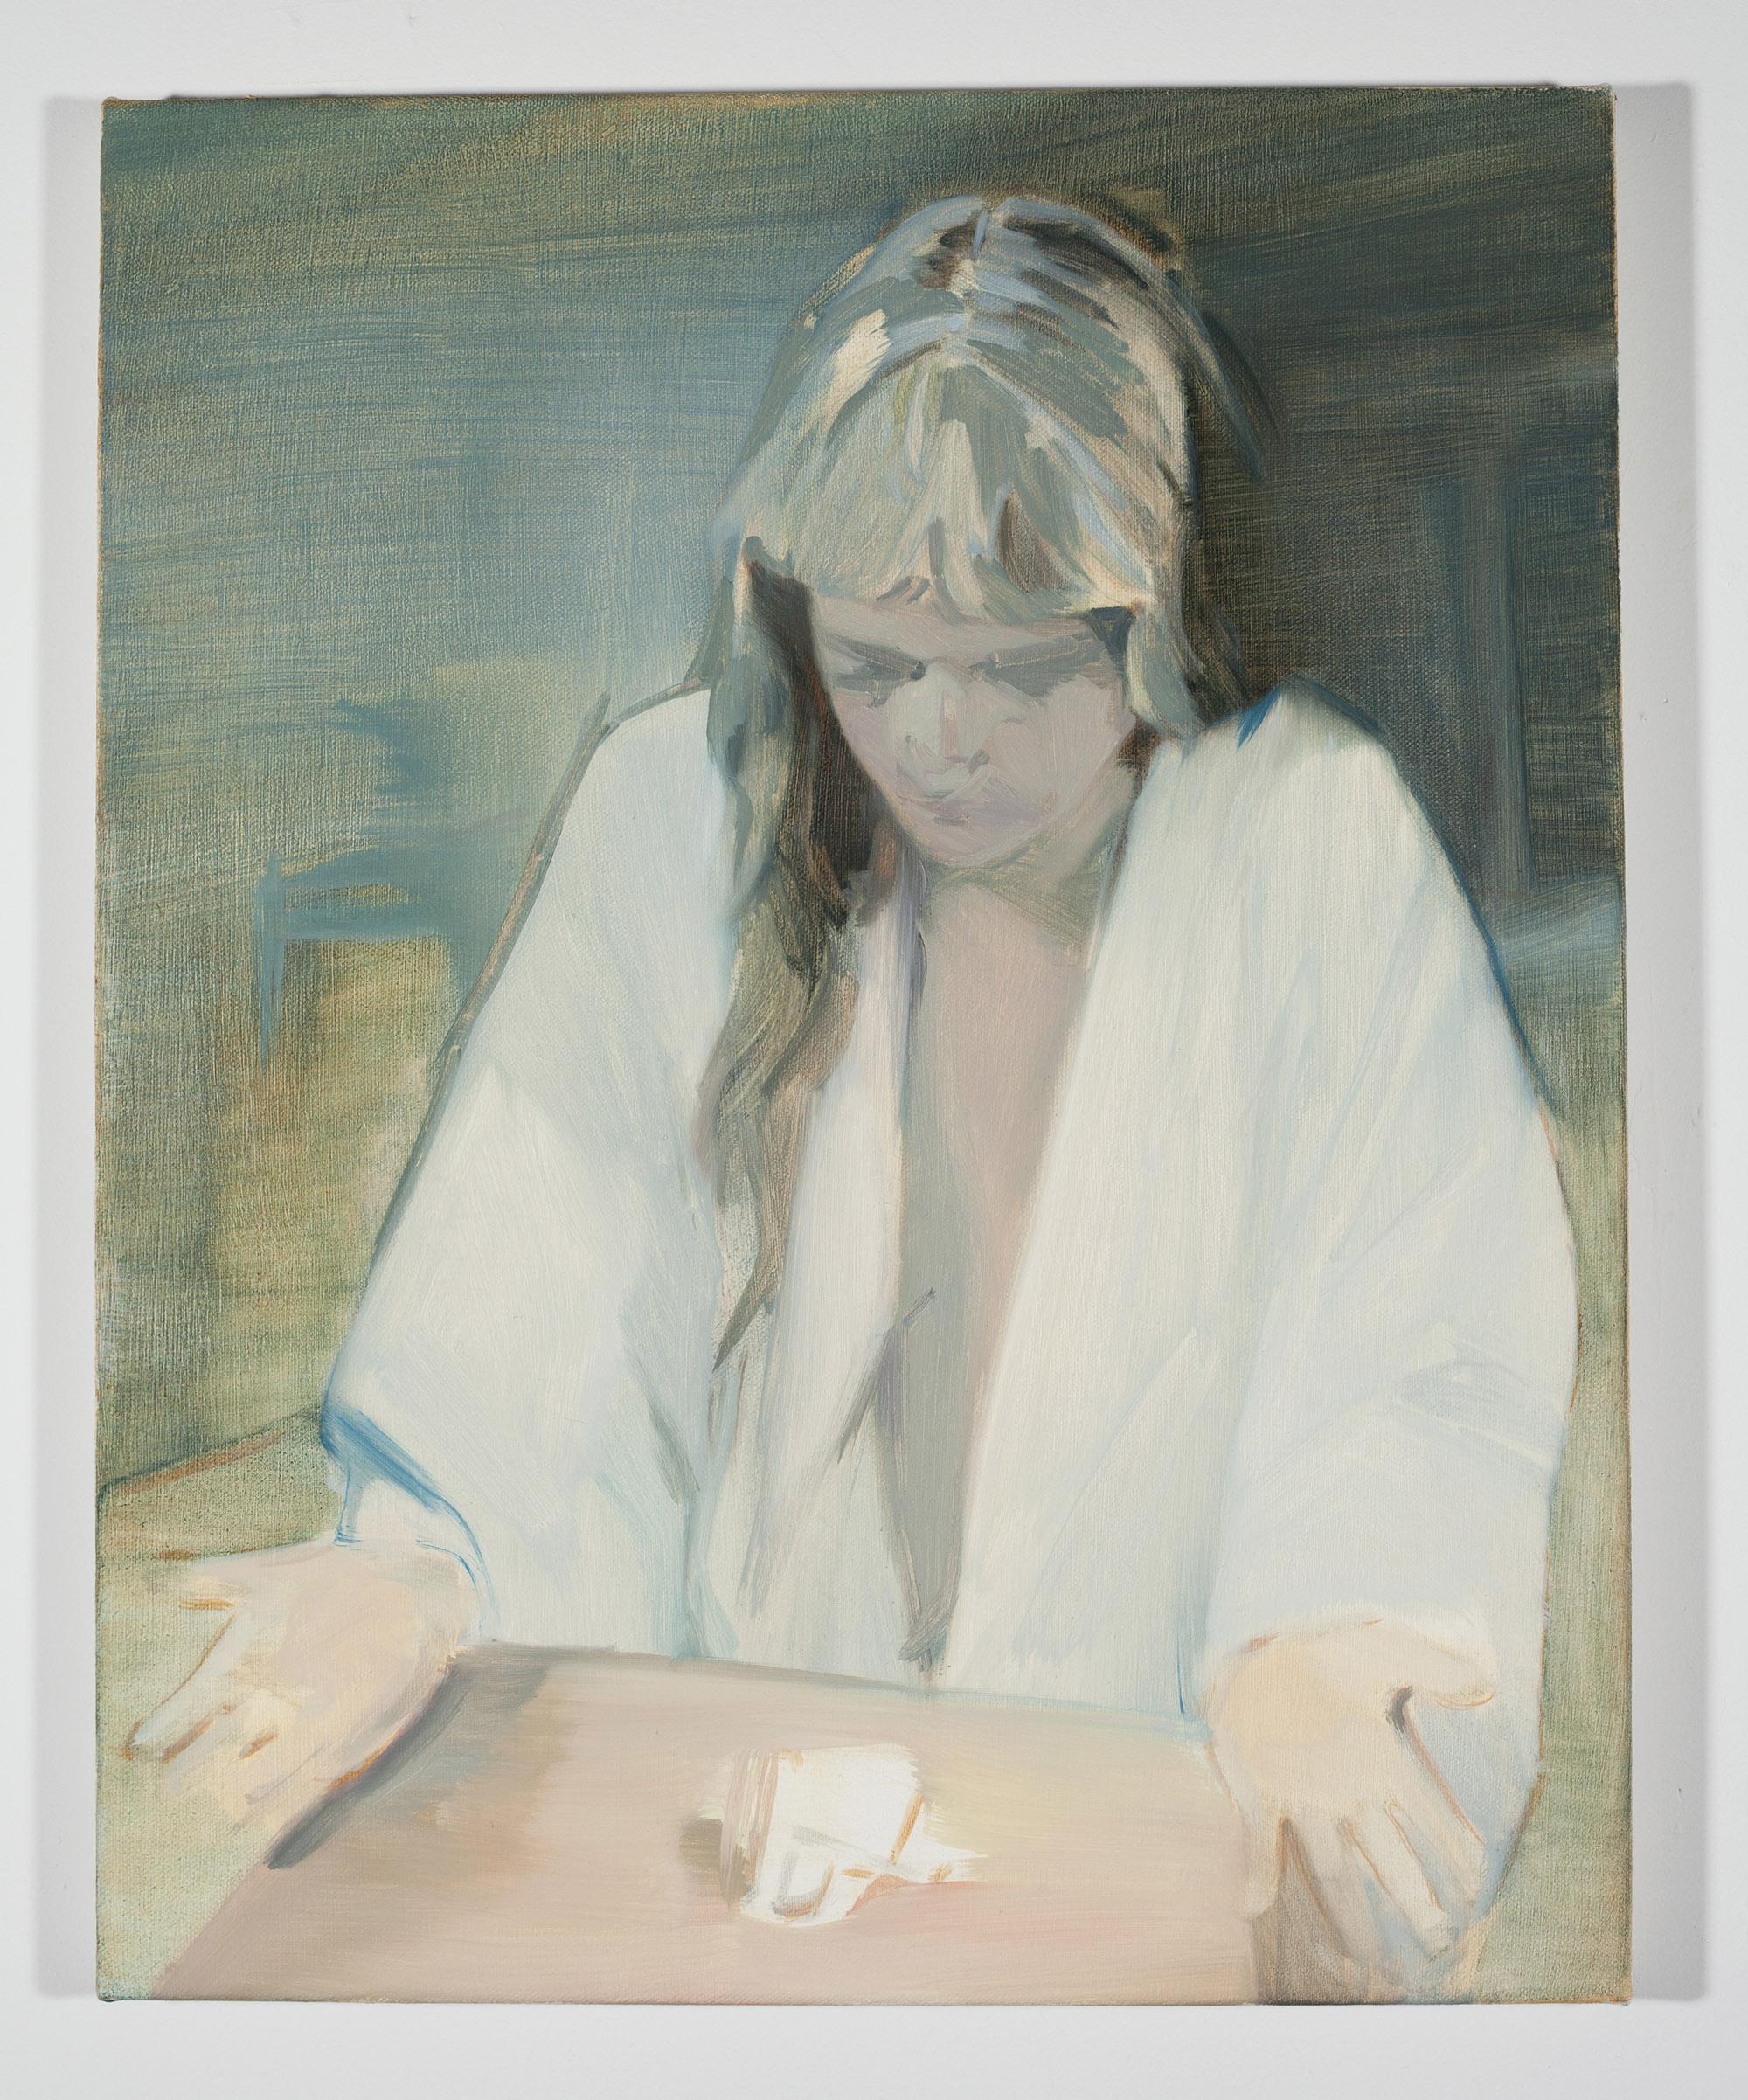 Corri-Lynn Tetz, Summon , 2017, oil on canvas, 16 x 20 inches